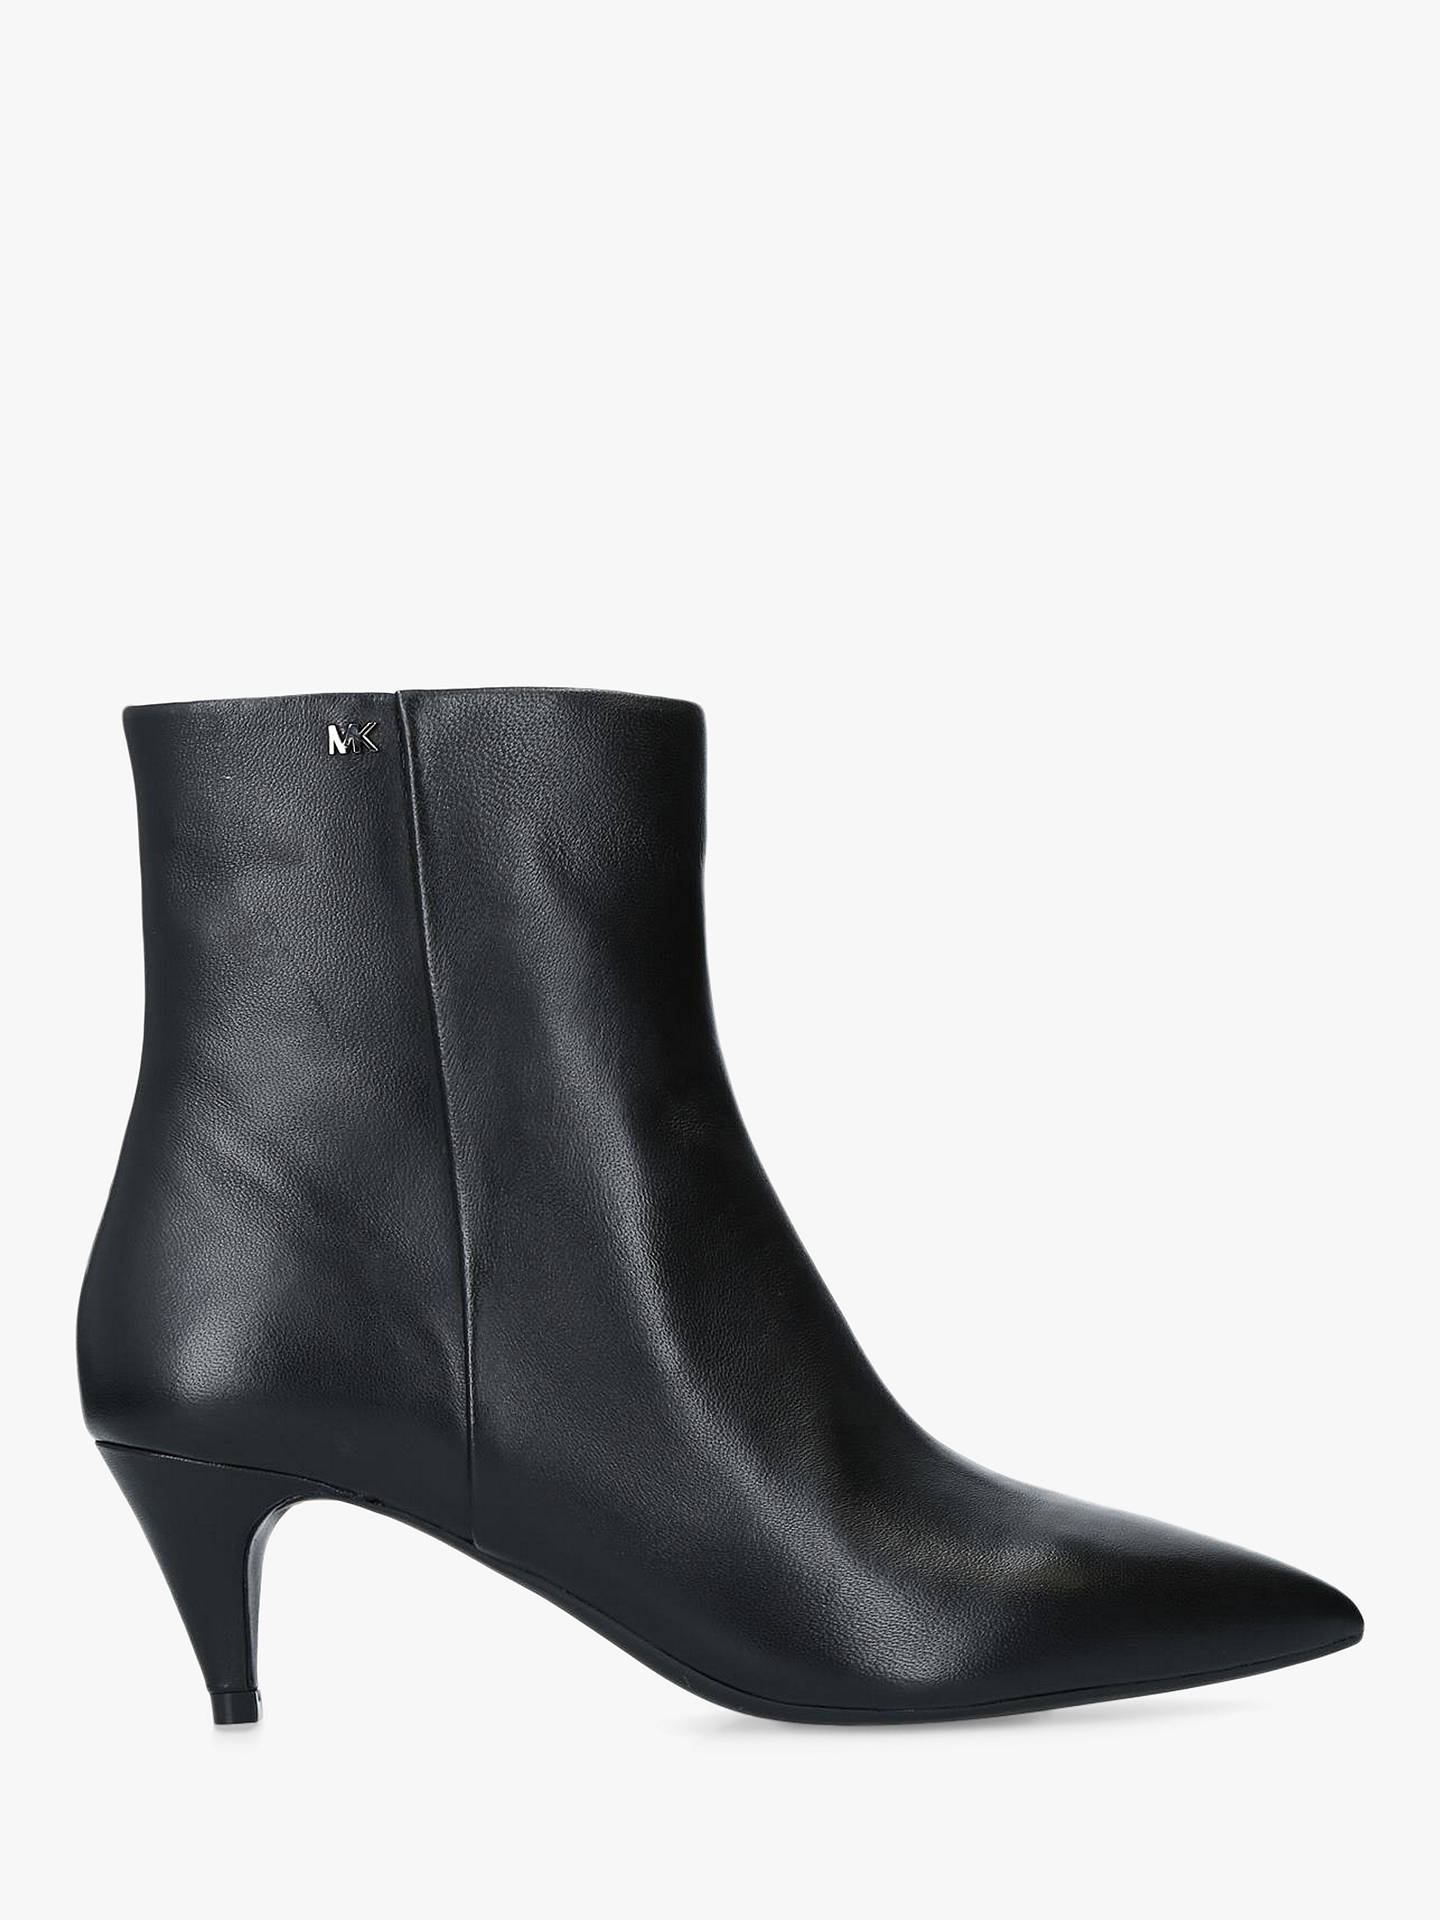 412437d5972 MICHAEL Michael Kors Blaine Flex Kitten Heel Ankle Boots, Black ...